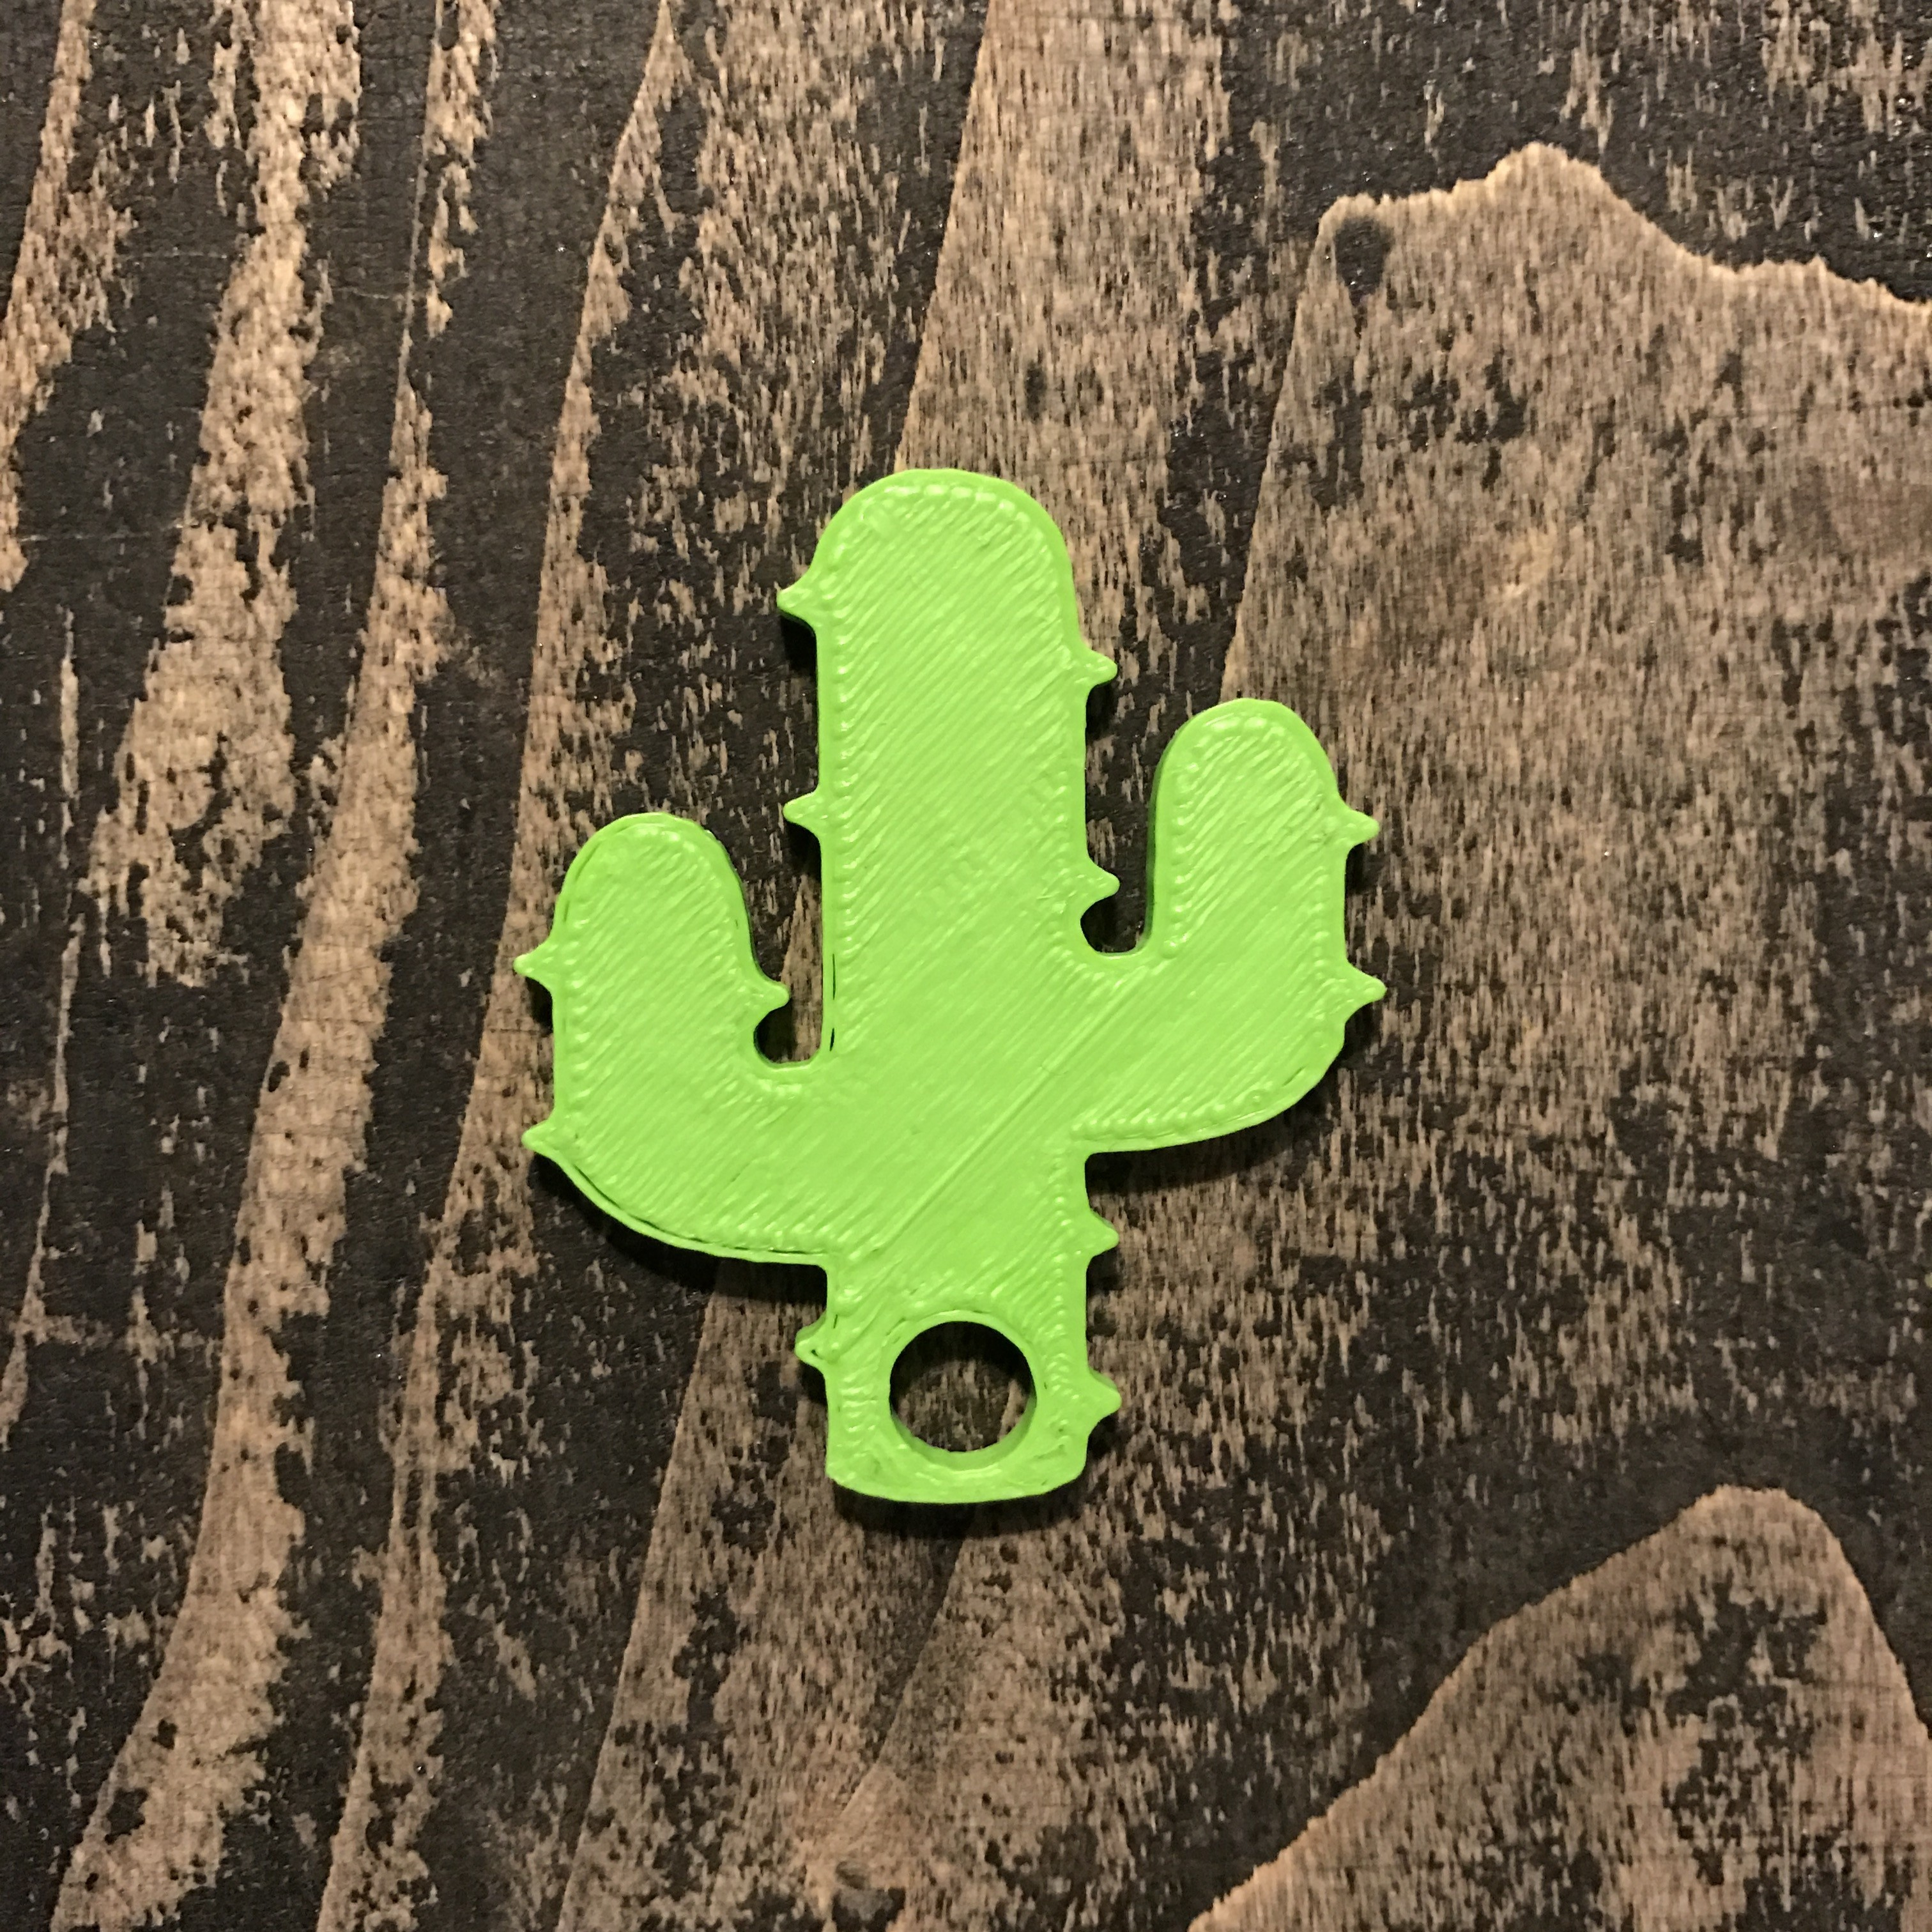 1.JPG Download free STL file Cactus keychain or pendant • 3D printing model, Free-3D-Models